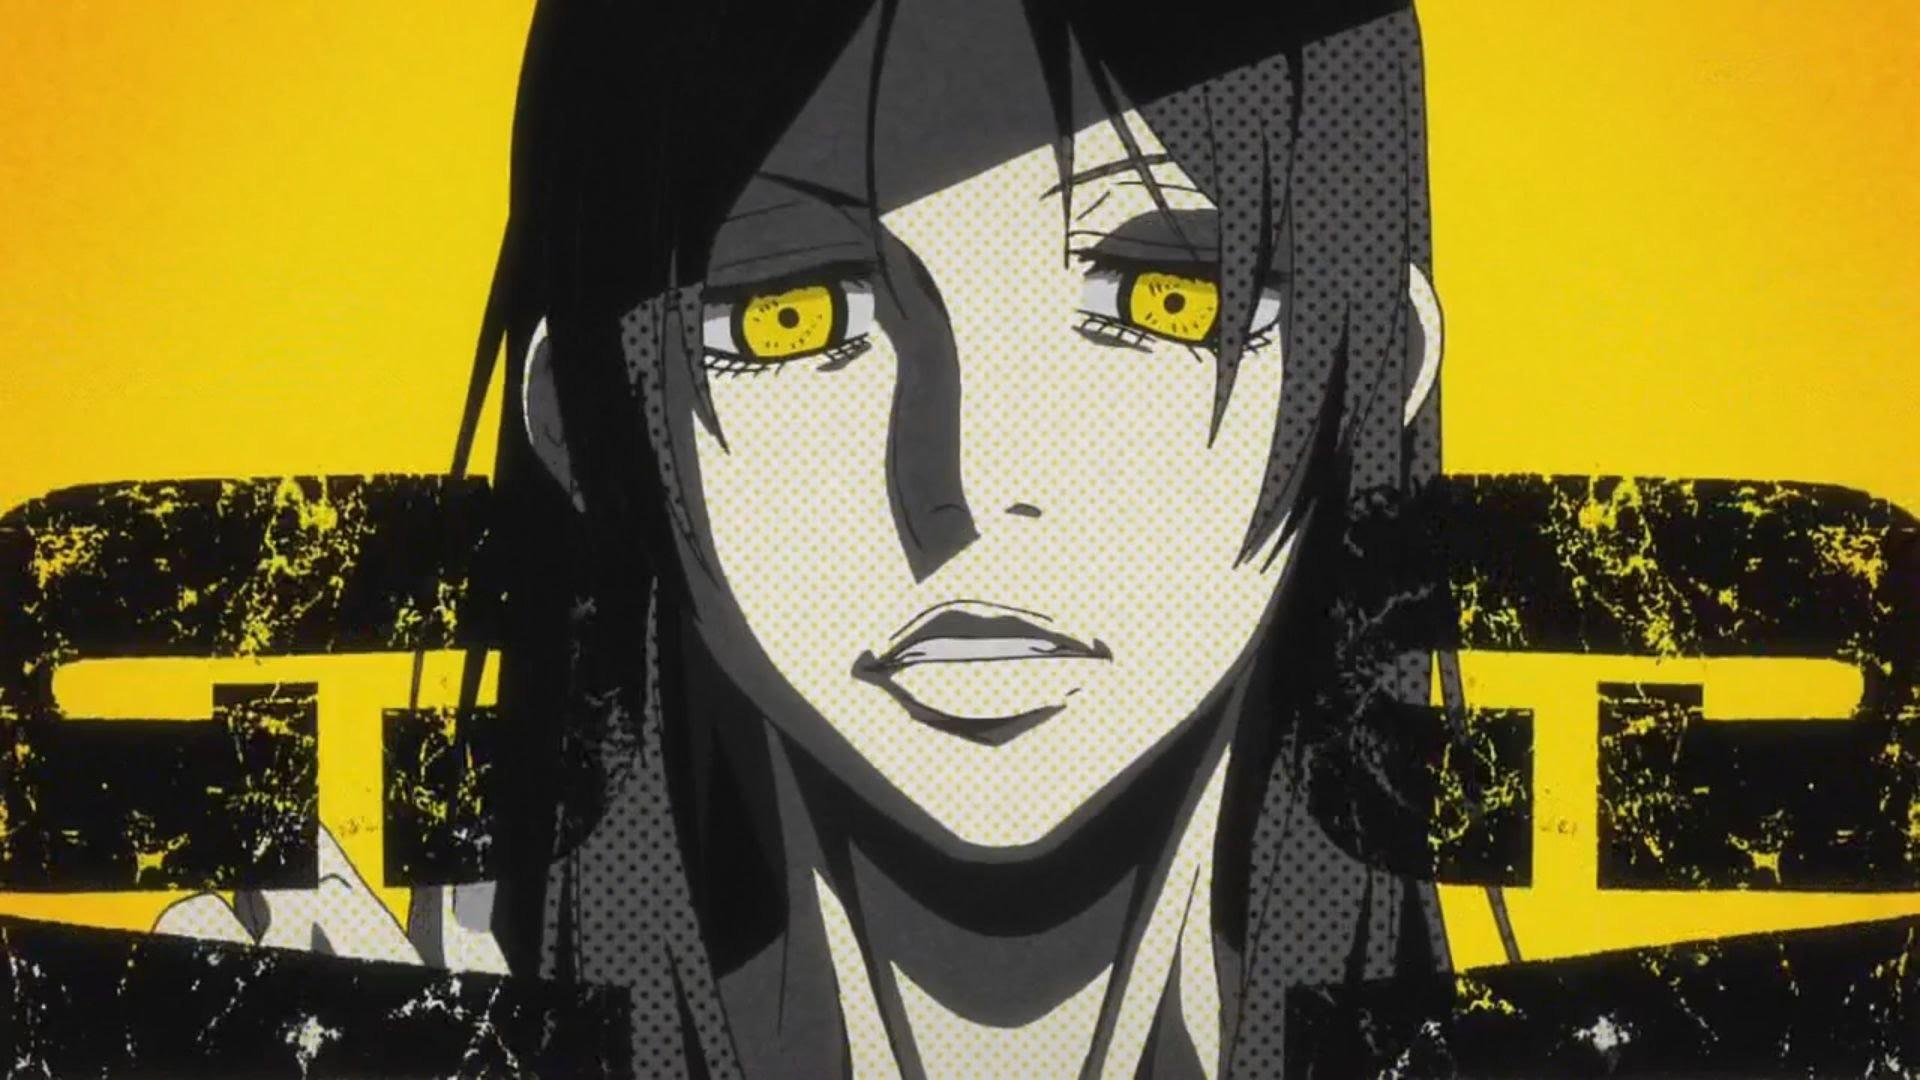 GANGSTA – Alex | xXGangstaXx | Pinterest | Manga, Manga anime and Anime